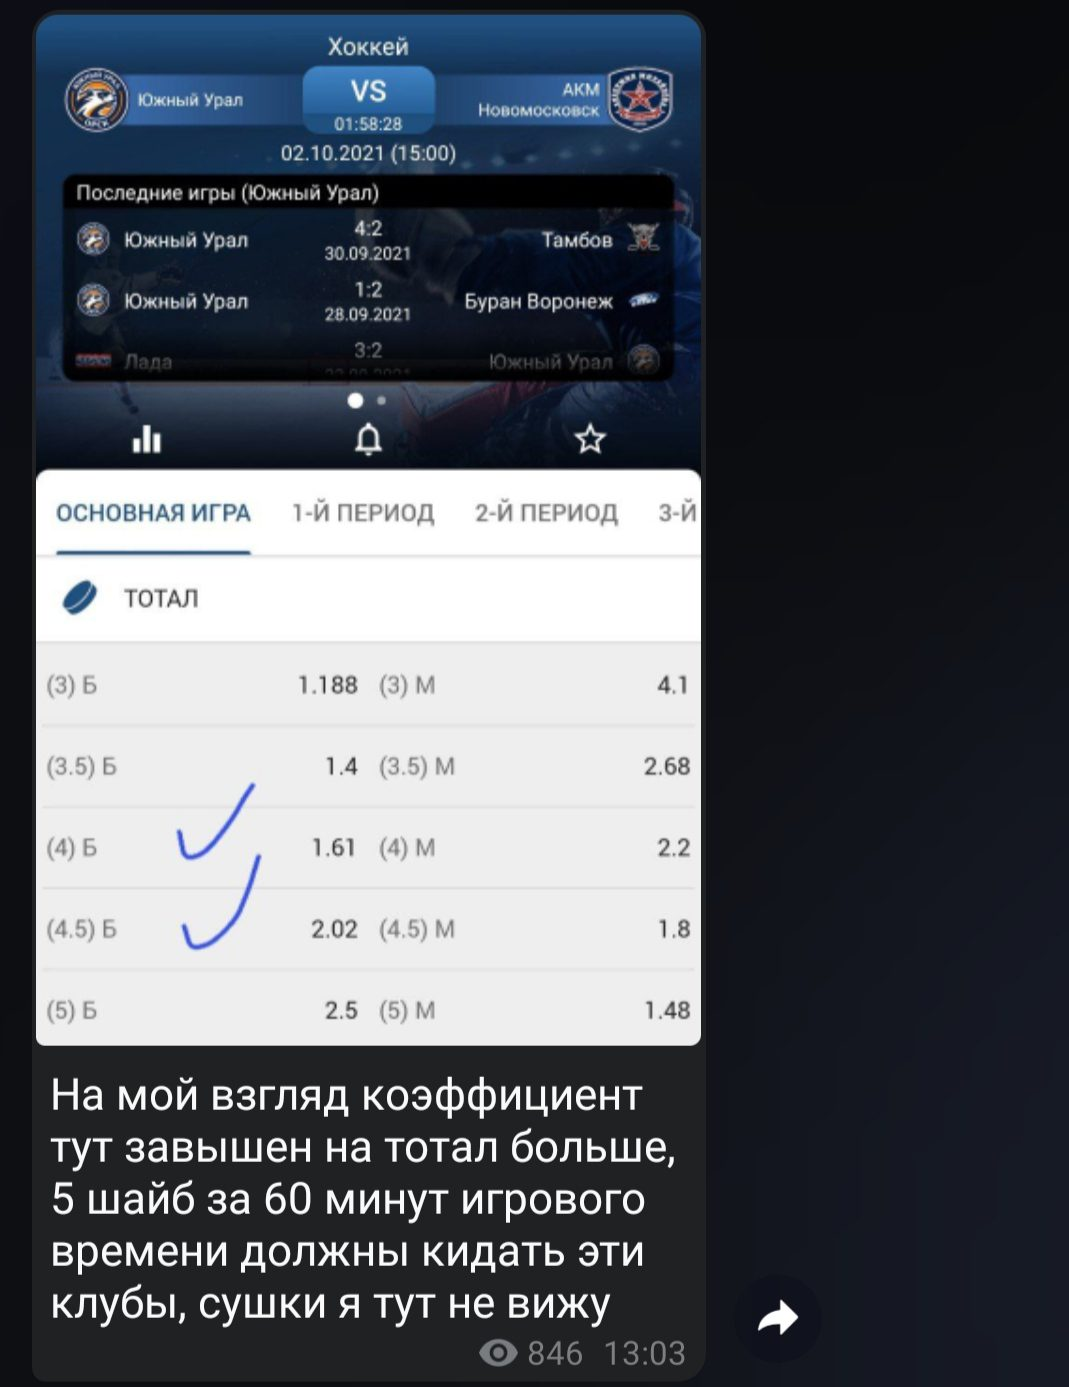 Телеграмм Канал Кухня Ставок - ставки на спорт